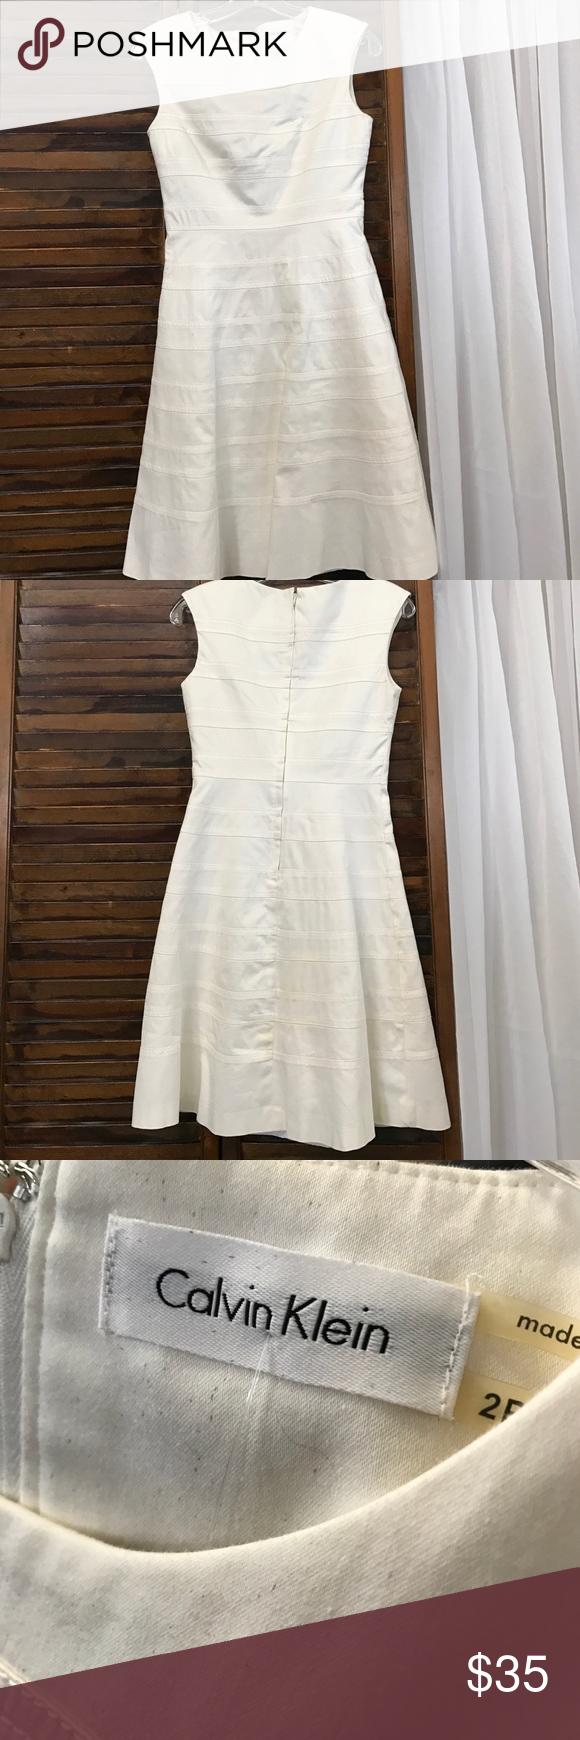 Calvin Klein dress Calvin Klein white dress. Invisible zipper in back. In good condition. Size 2 Calvin Klein Dresses